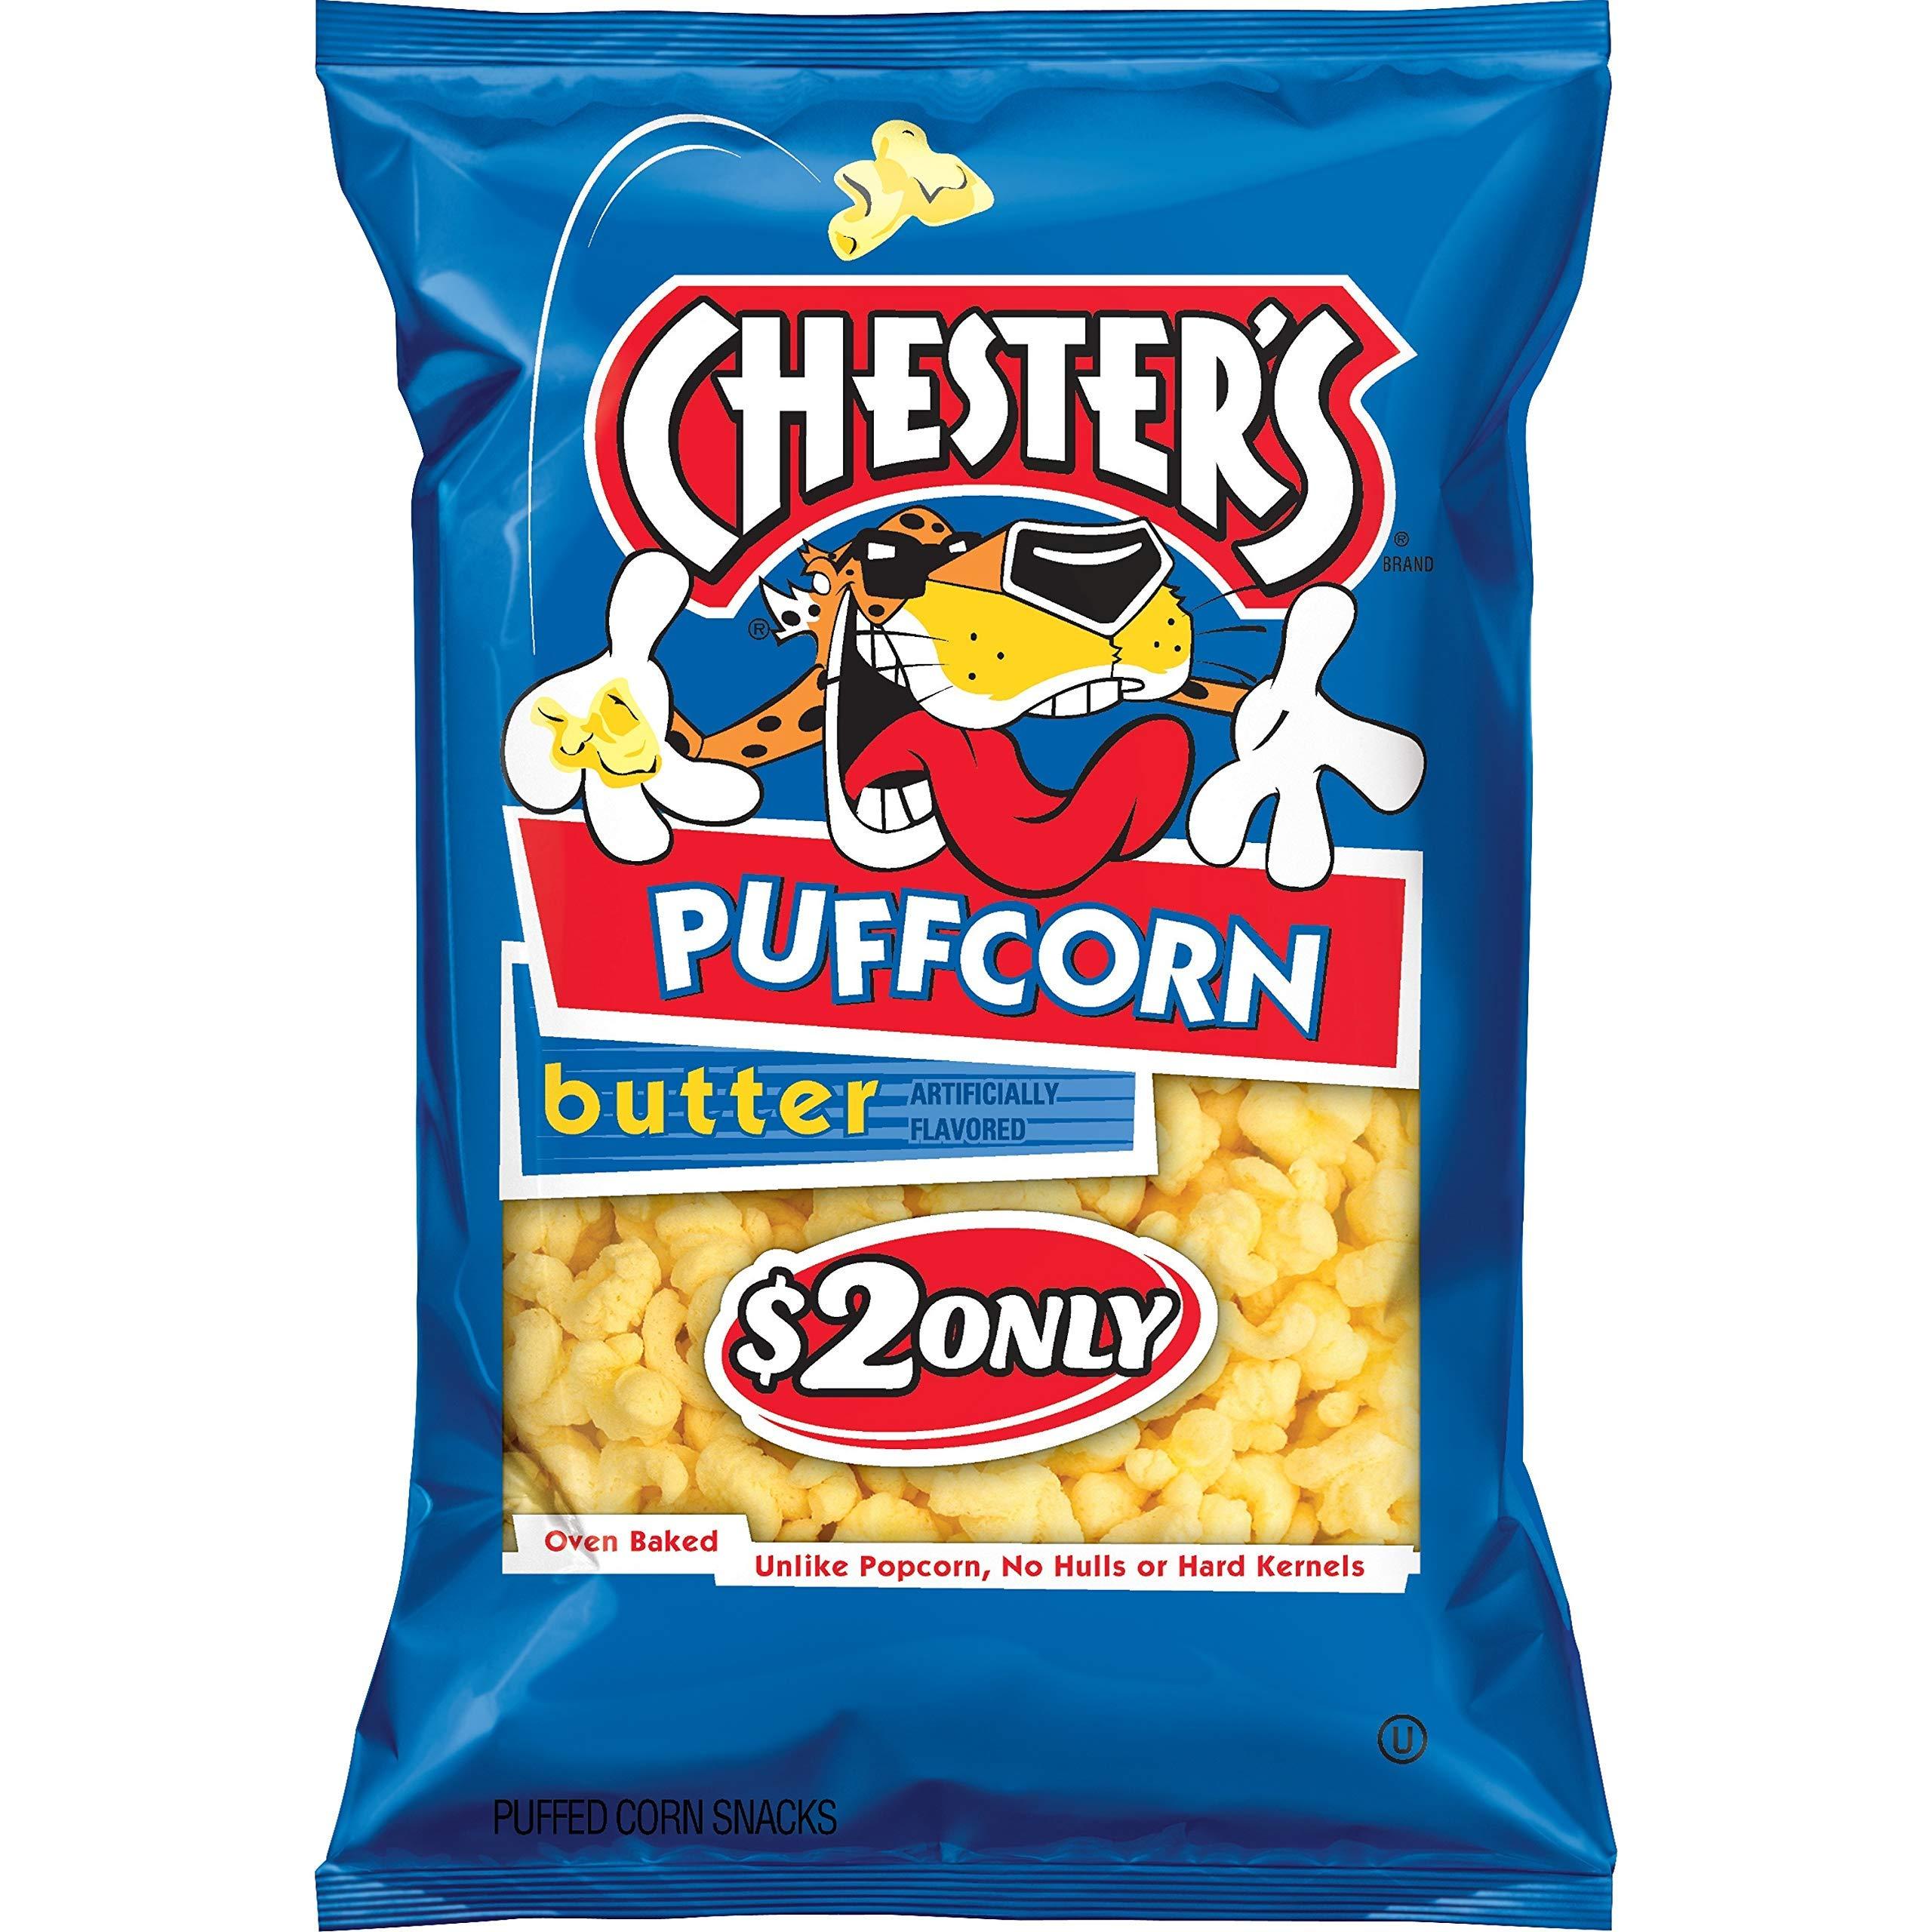 Chester's Puffcorn Butter Puffed Corn Snacks, 3.5 Oz (1 bag) - SET OF 4